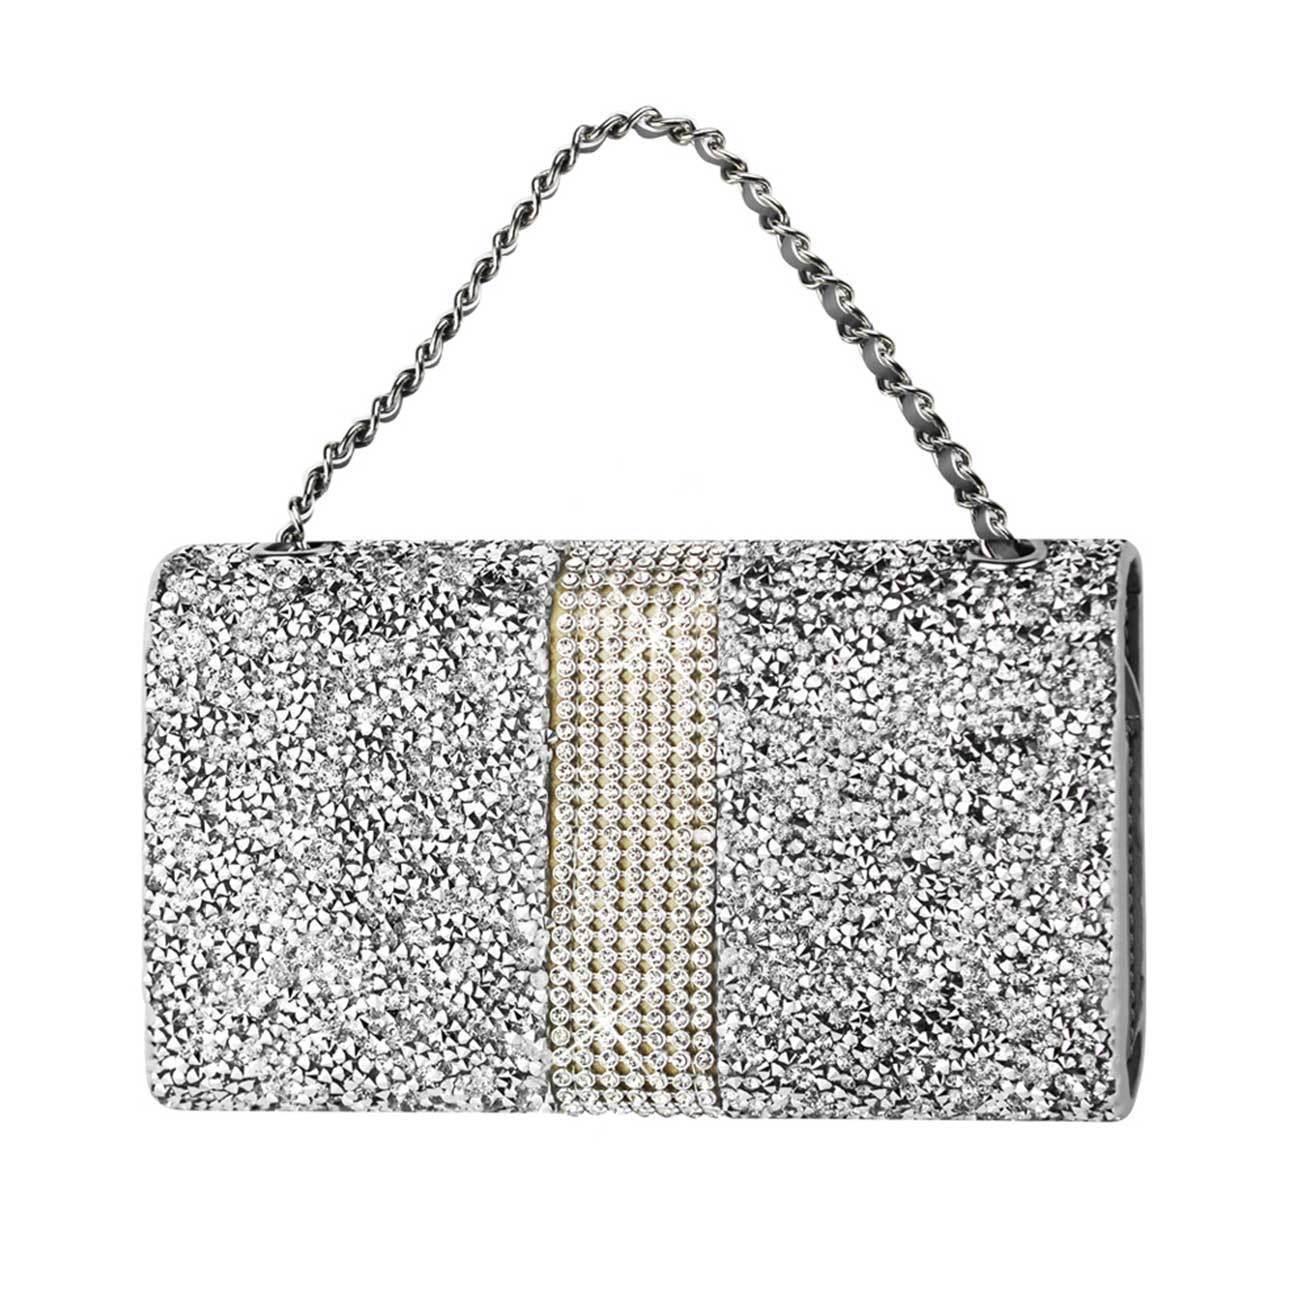 Diamond Bling Credit Card Silver Wallet fits LG Aristo 2